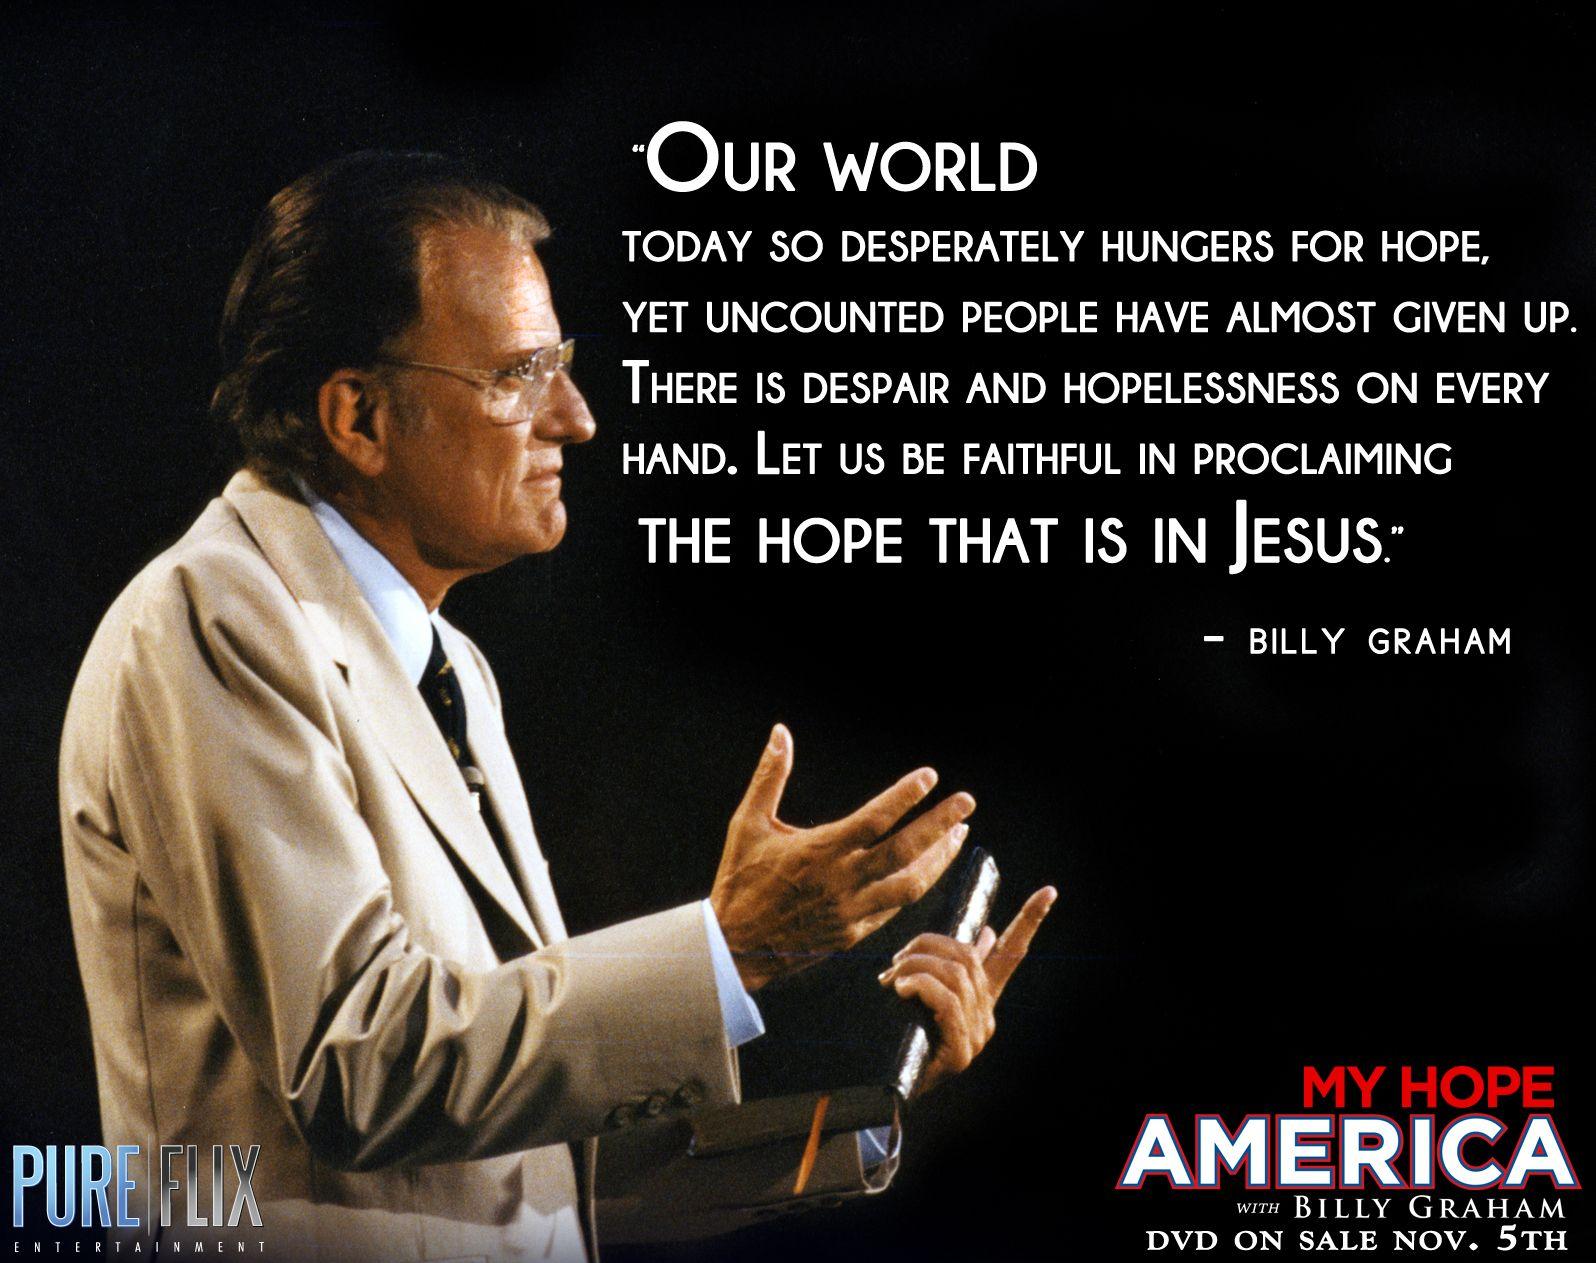 Billy Graham - My Hope America -